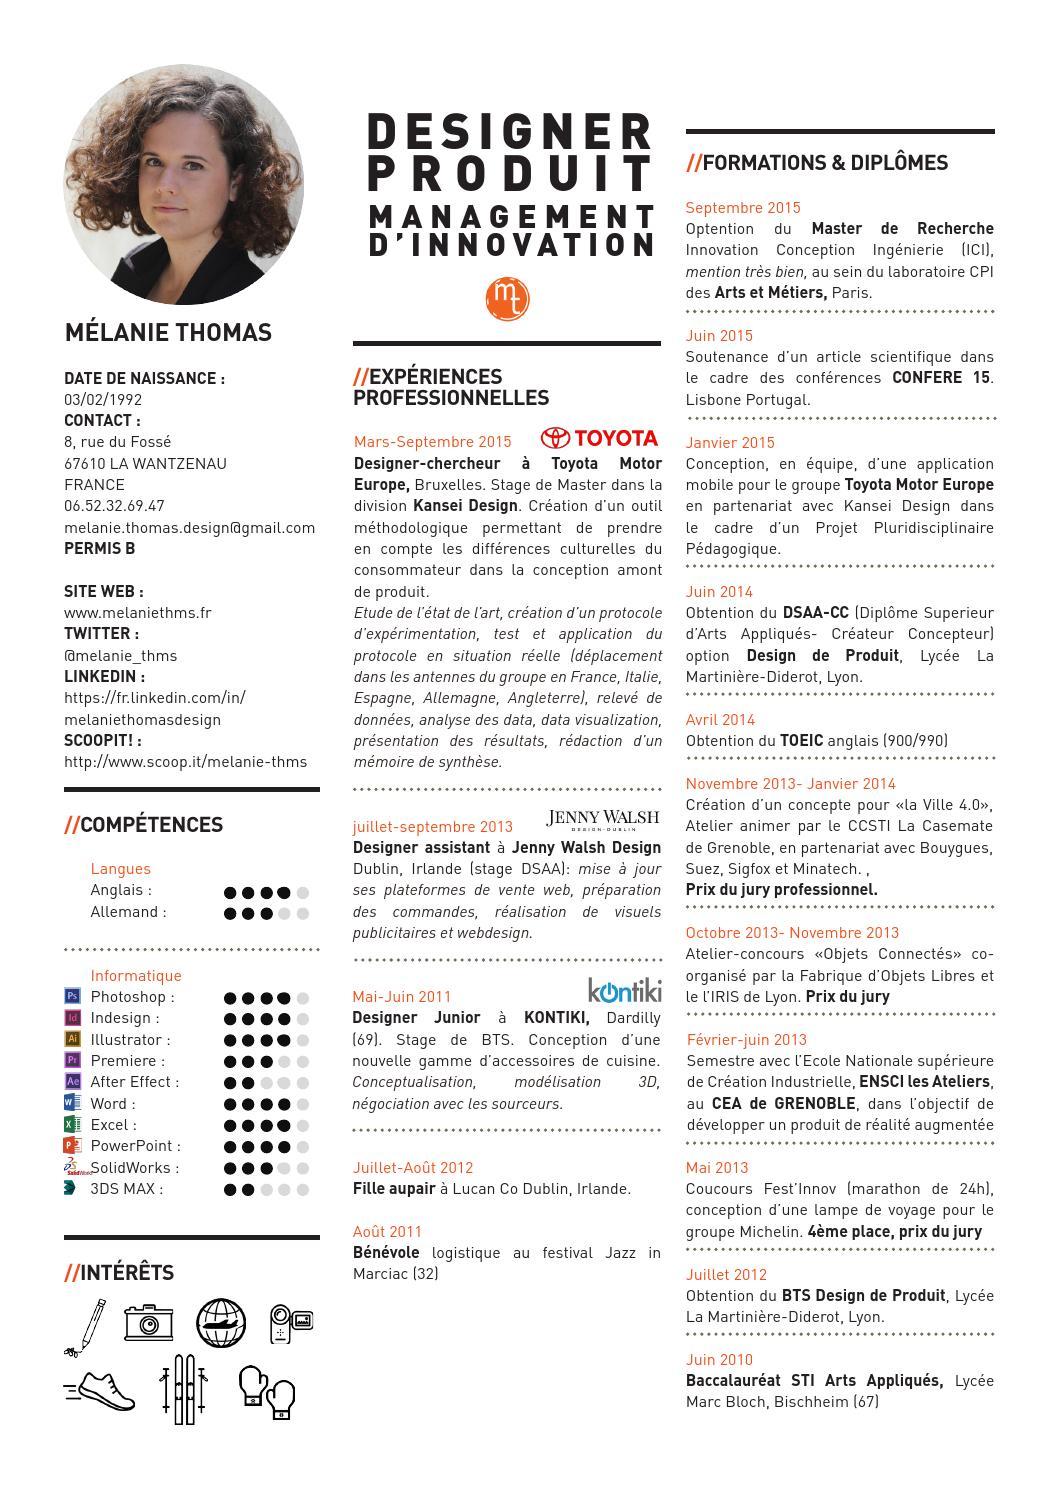 cv designer allemand